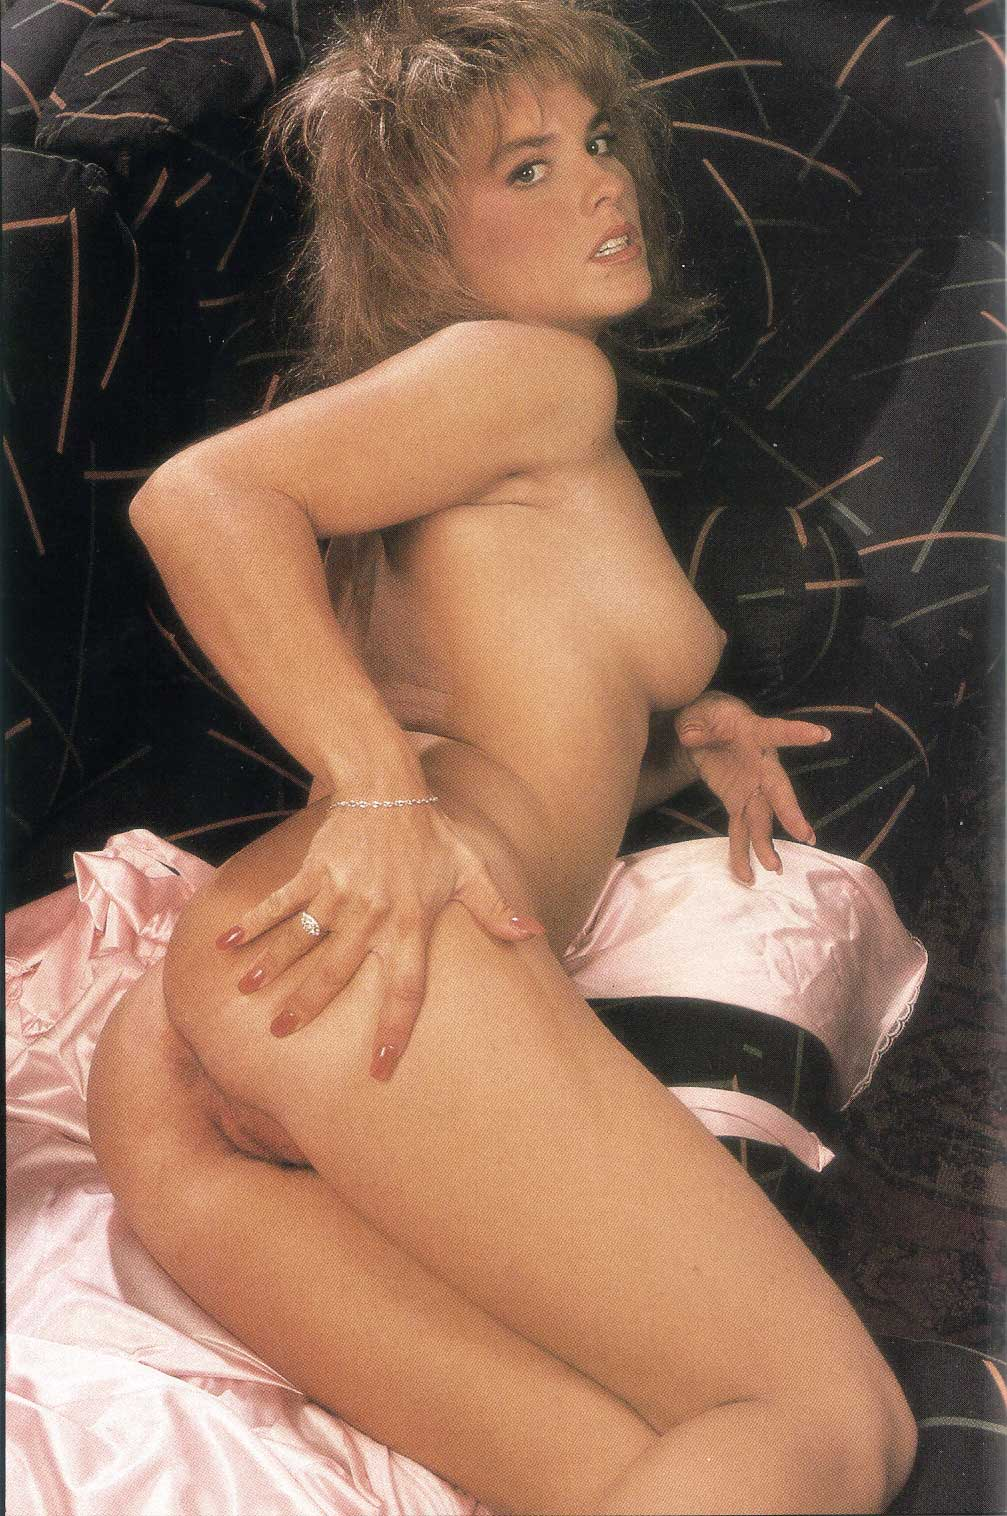 April West Porn Actress Today - April West